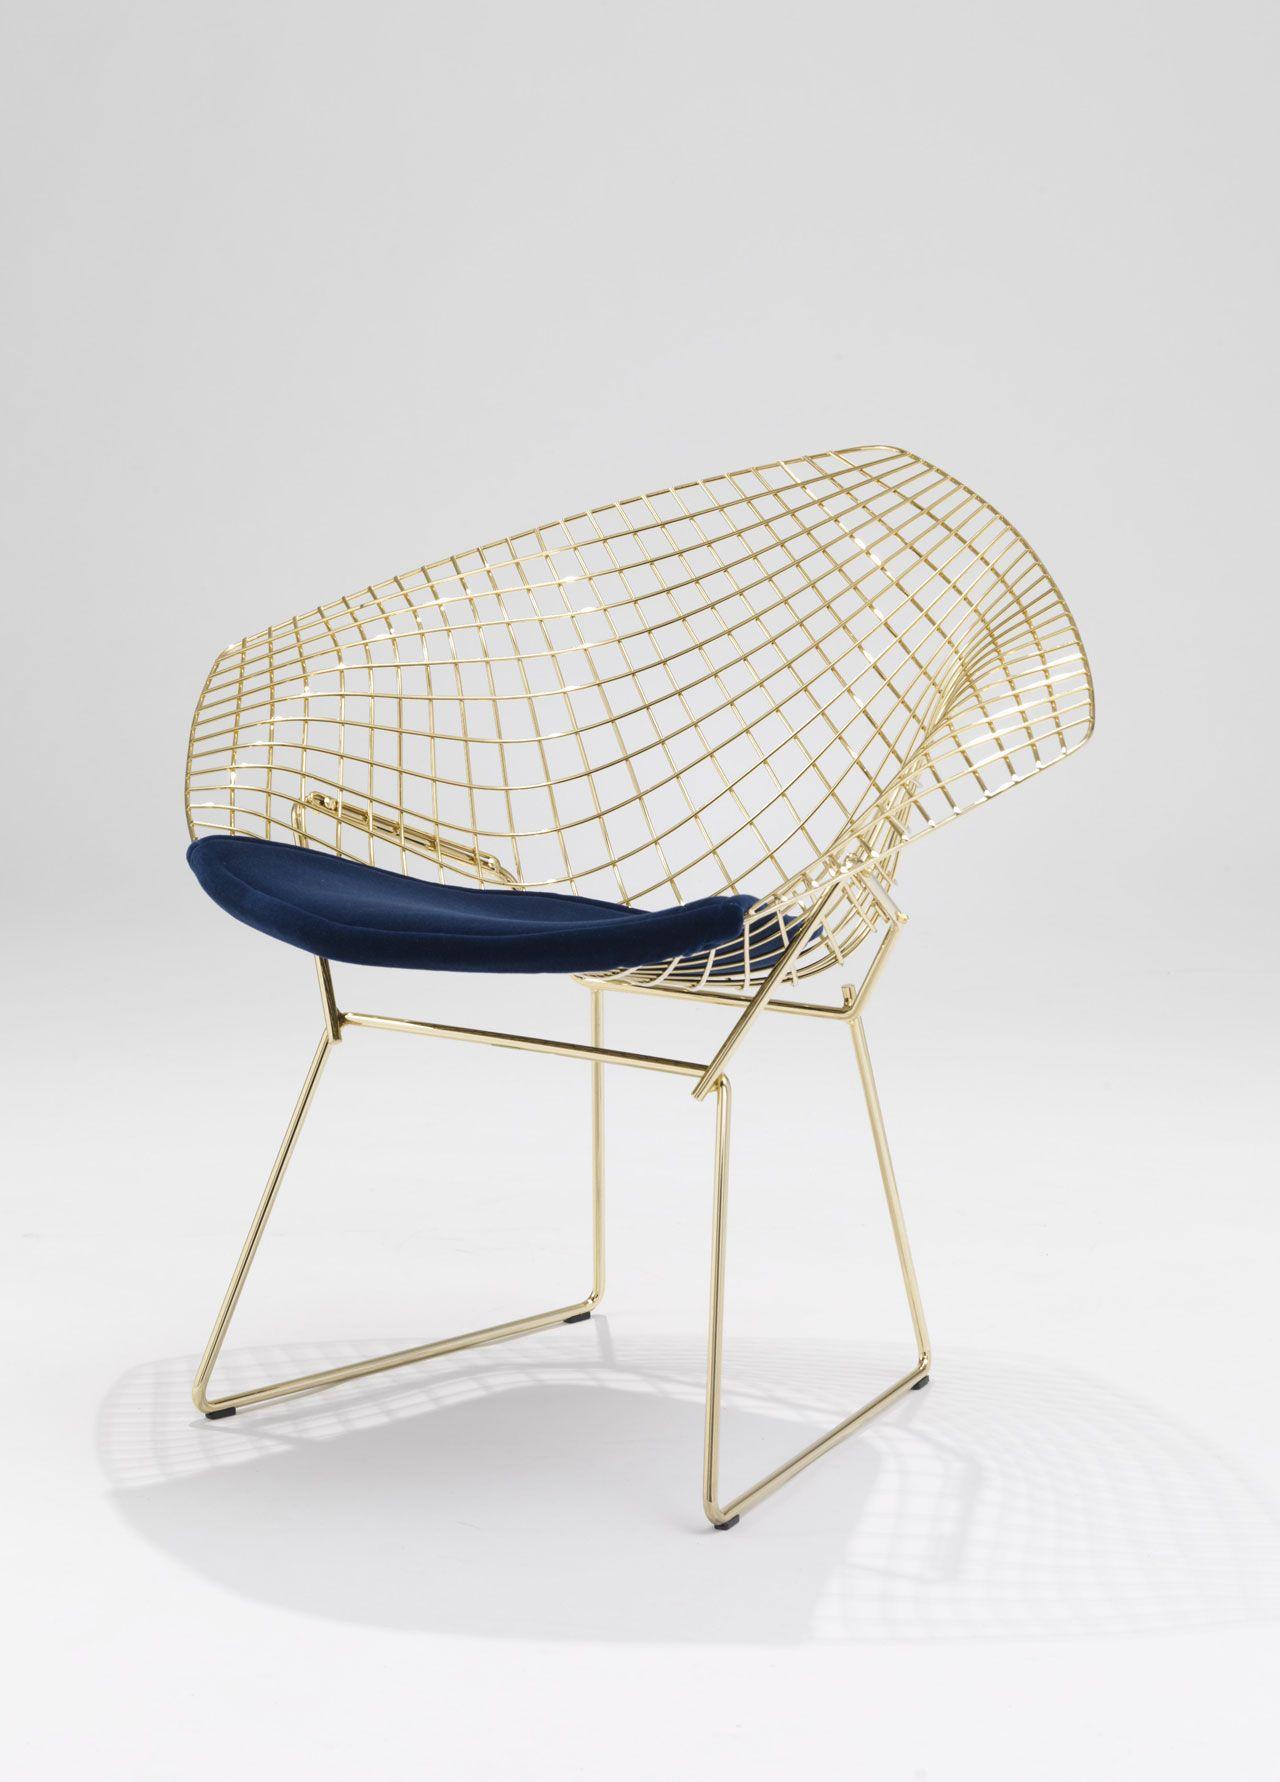 Bertoia diamond chair sheepskin - Best Of Milan Design Week 2016 Harry Bertoiachair